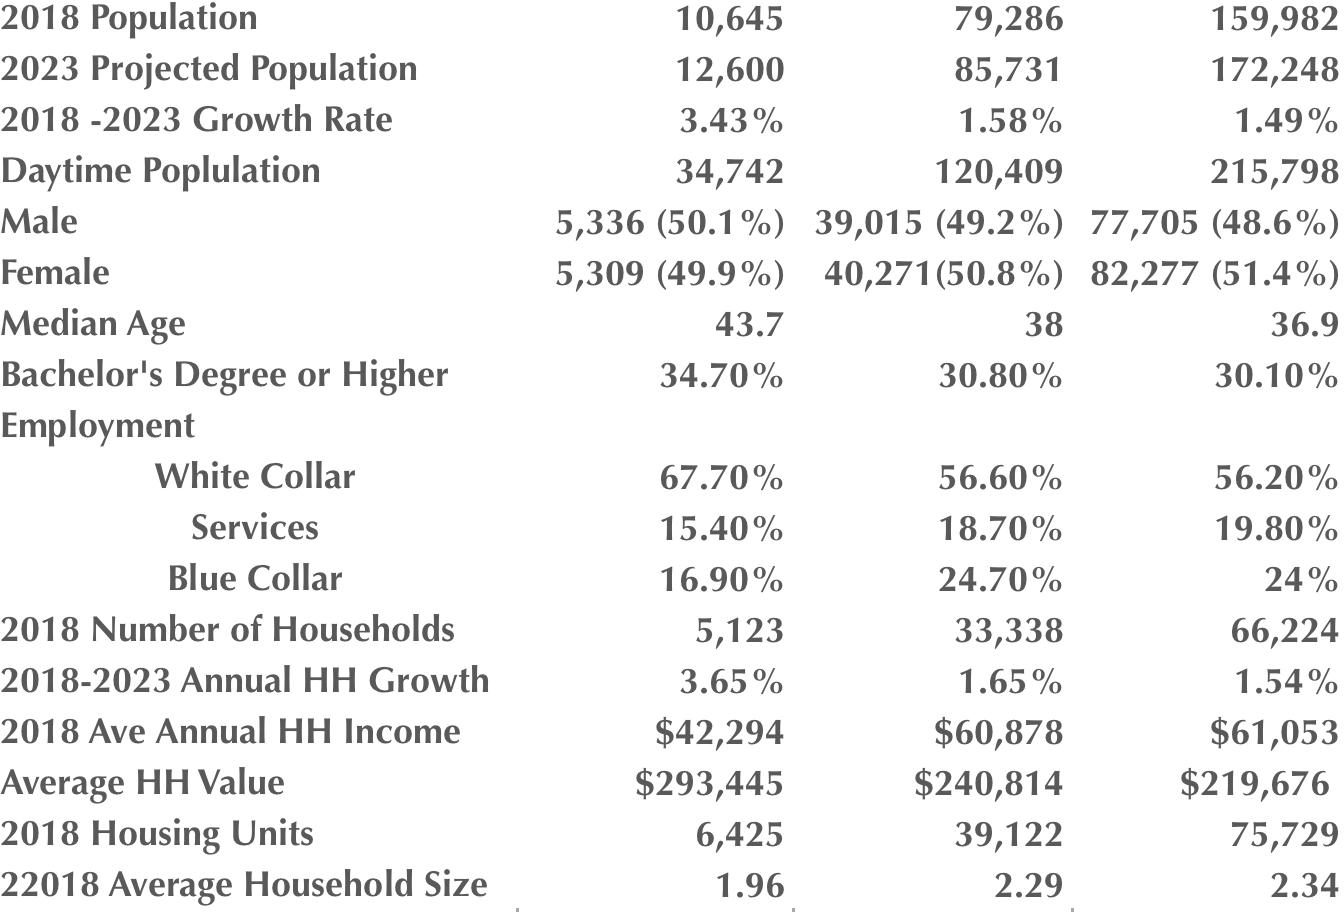 GREENVILLE Demographics.png